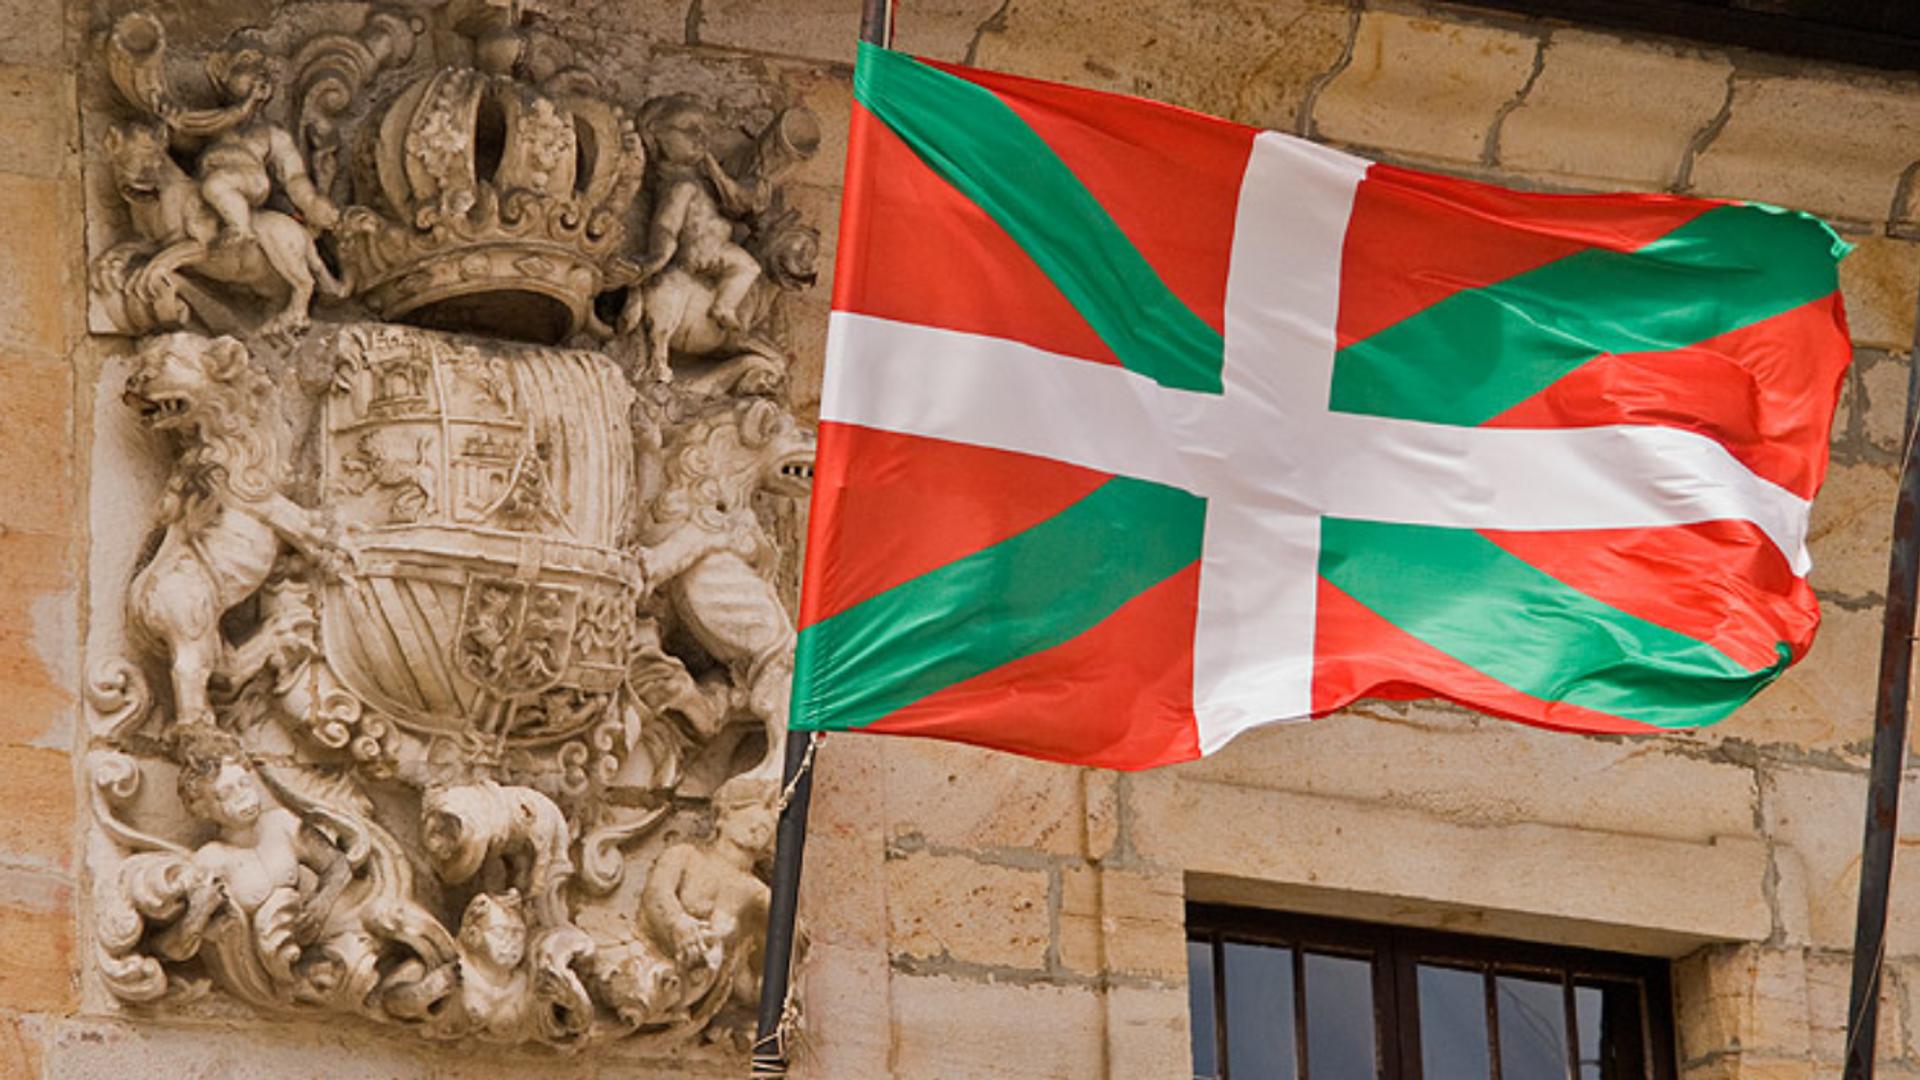 Bandera oficial del País Vasco adoptada por el Estatuto de Autonomía de 1979 - Sputnik Mundo, 1920, 09.08.2021